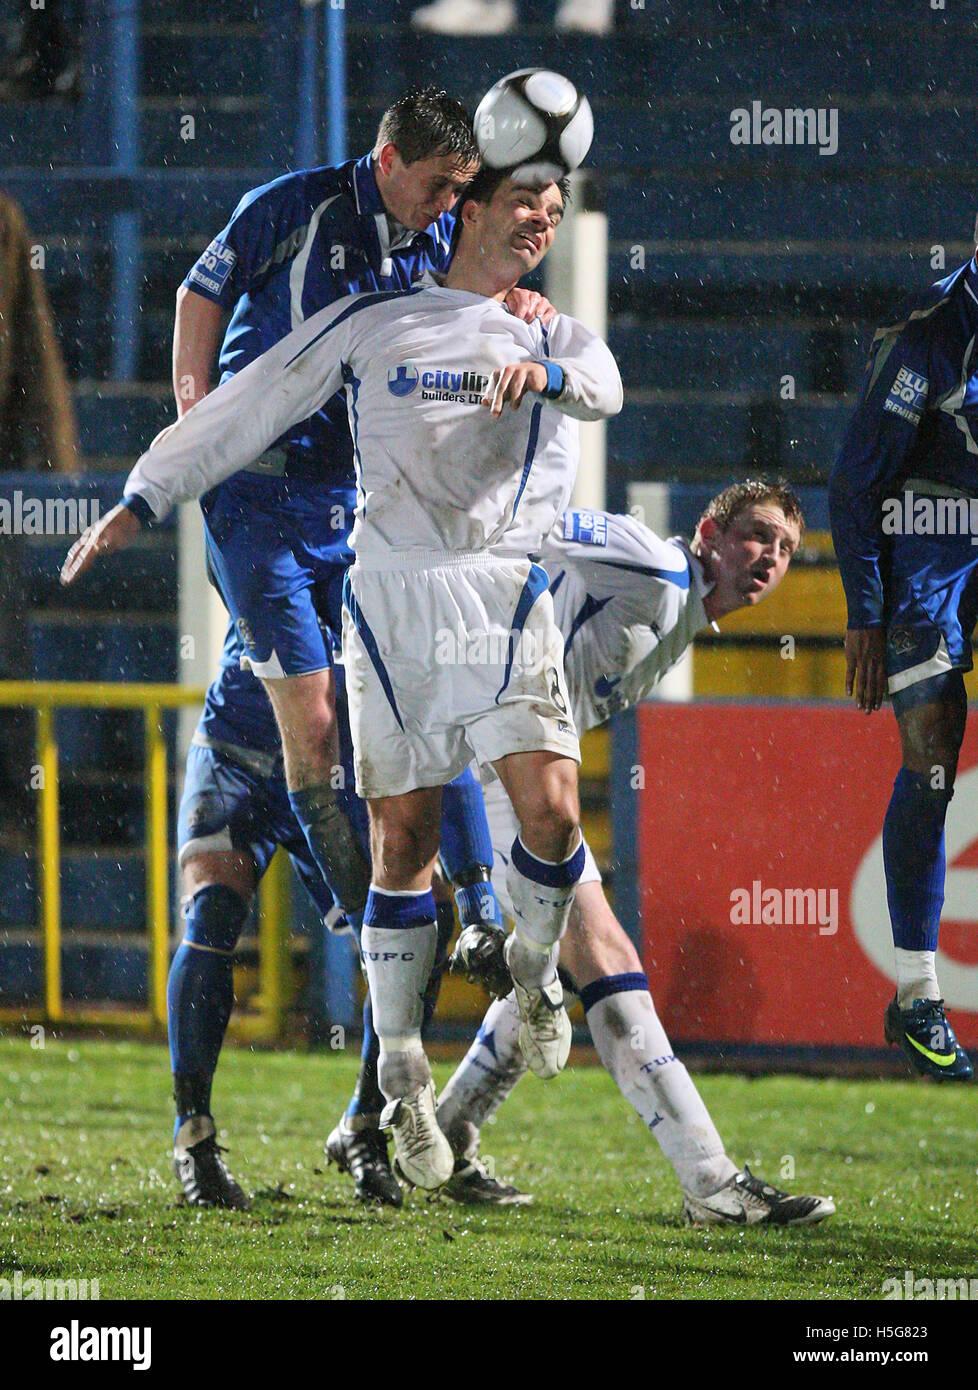 George Beavan of Grays rises above Tim Sills of Torquay - Grays Athletic vs Torquay United - Blue Square Premier - Stock Image